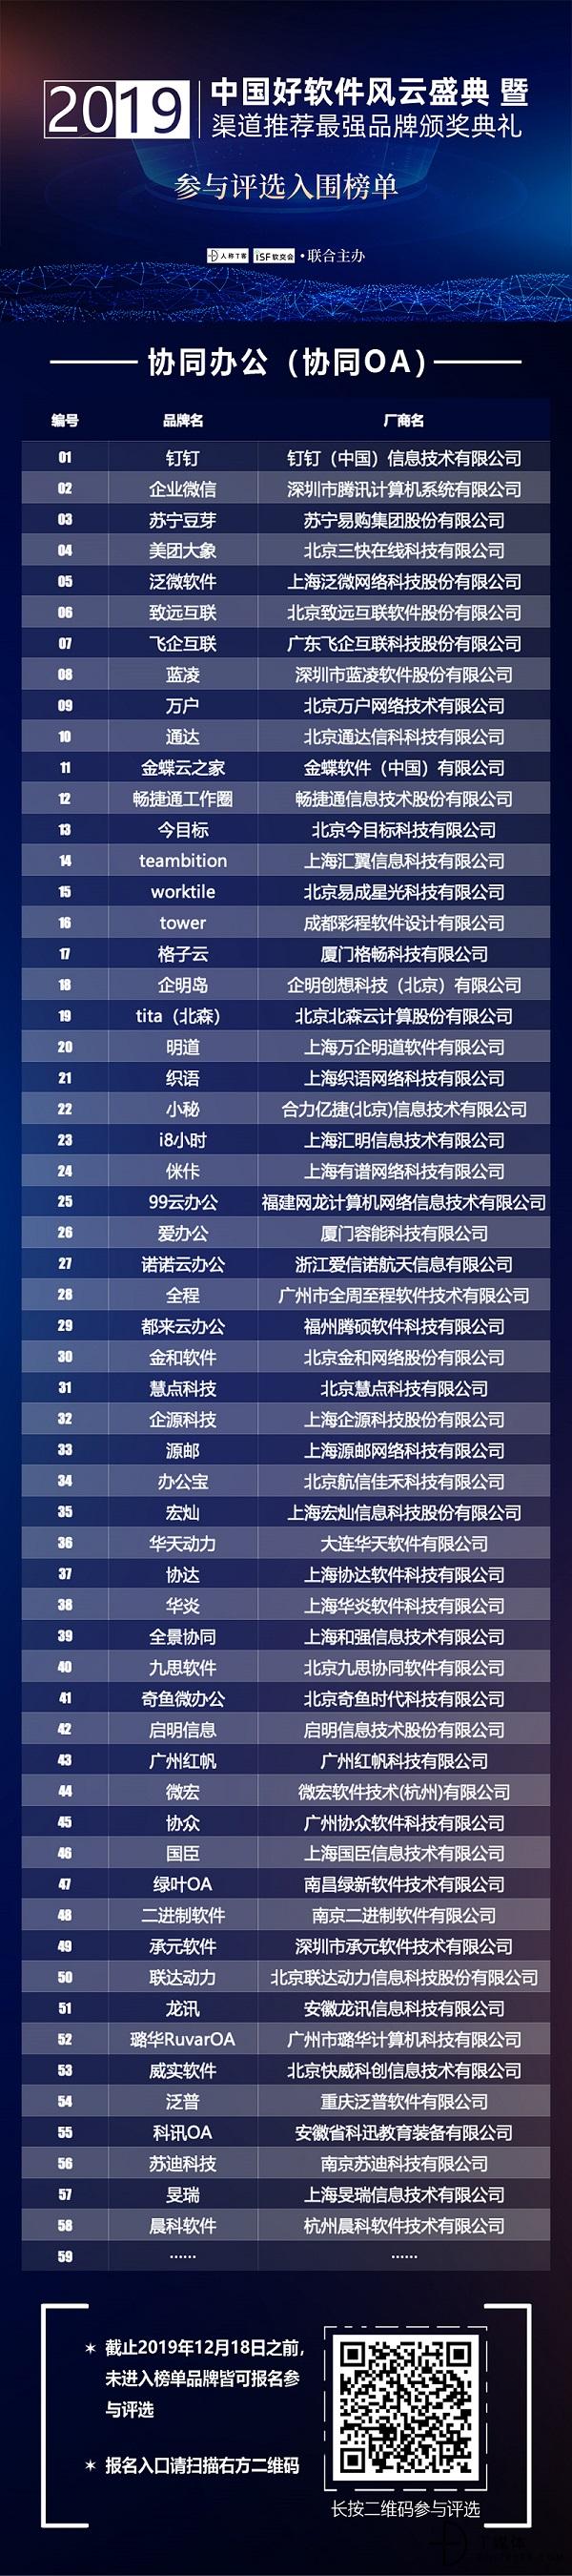 OA榜单.jpg